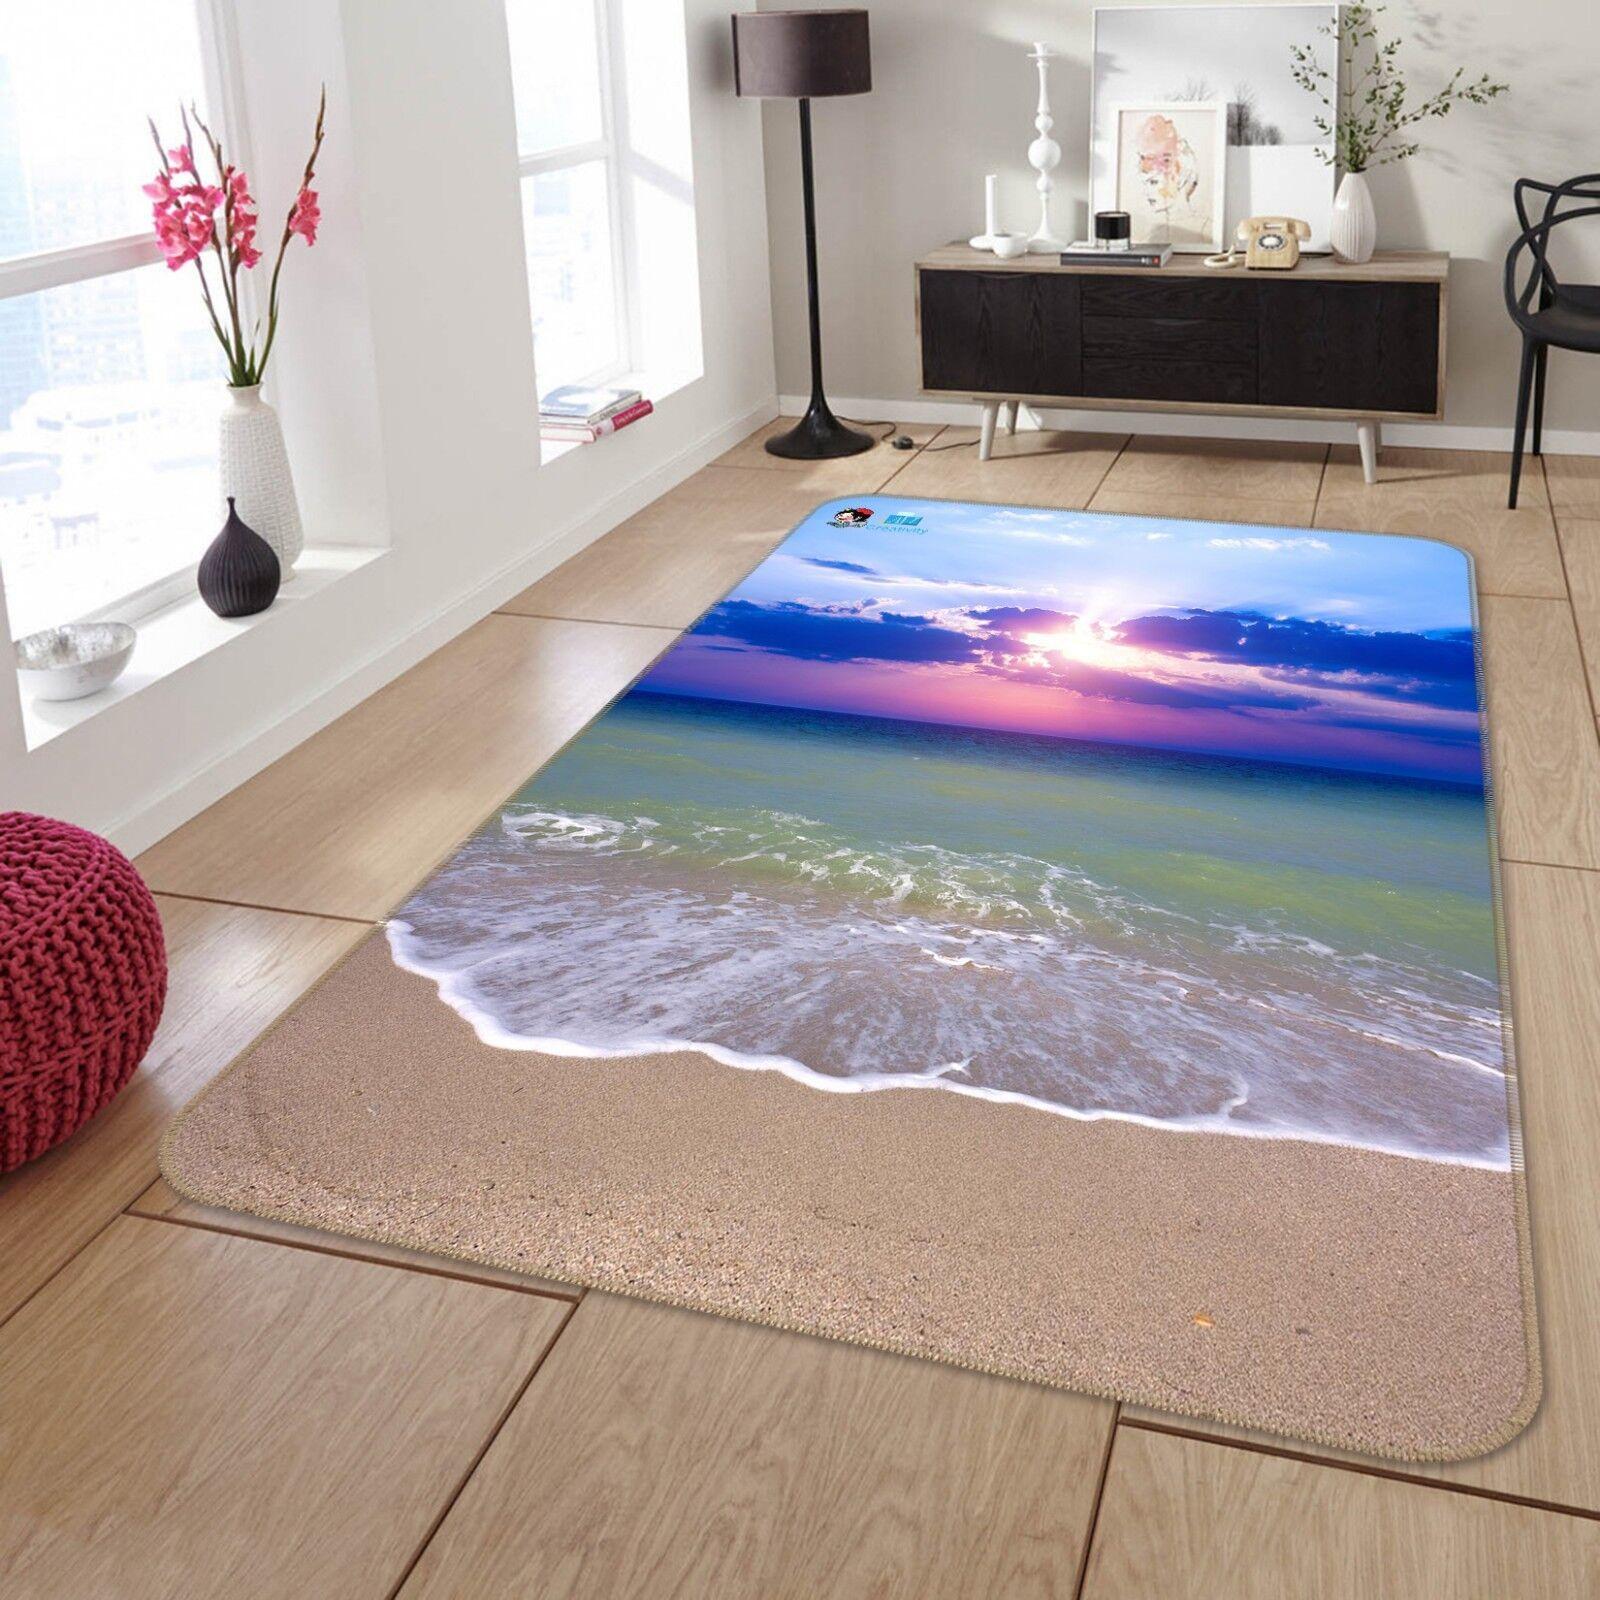 3D Sunny Surf Beach 66 tappetino antiscivolo tappeto camera Tappetino Qualità Elegante foto Tappeto UK